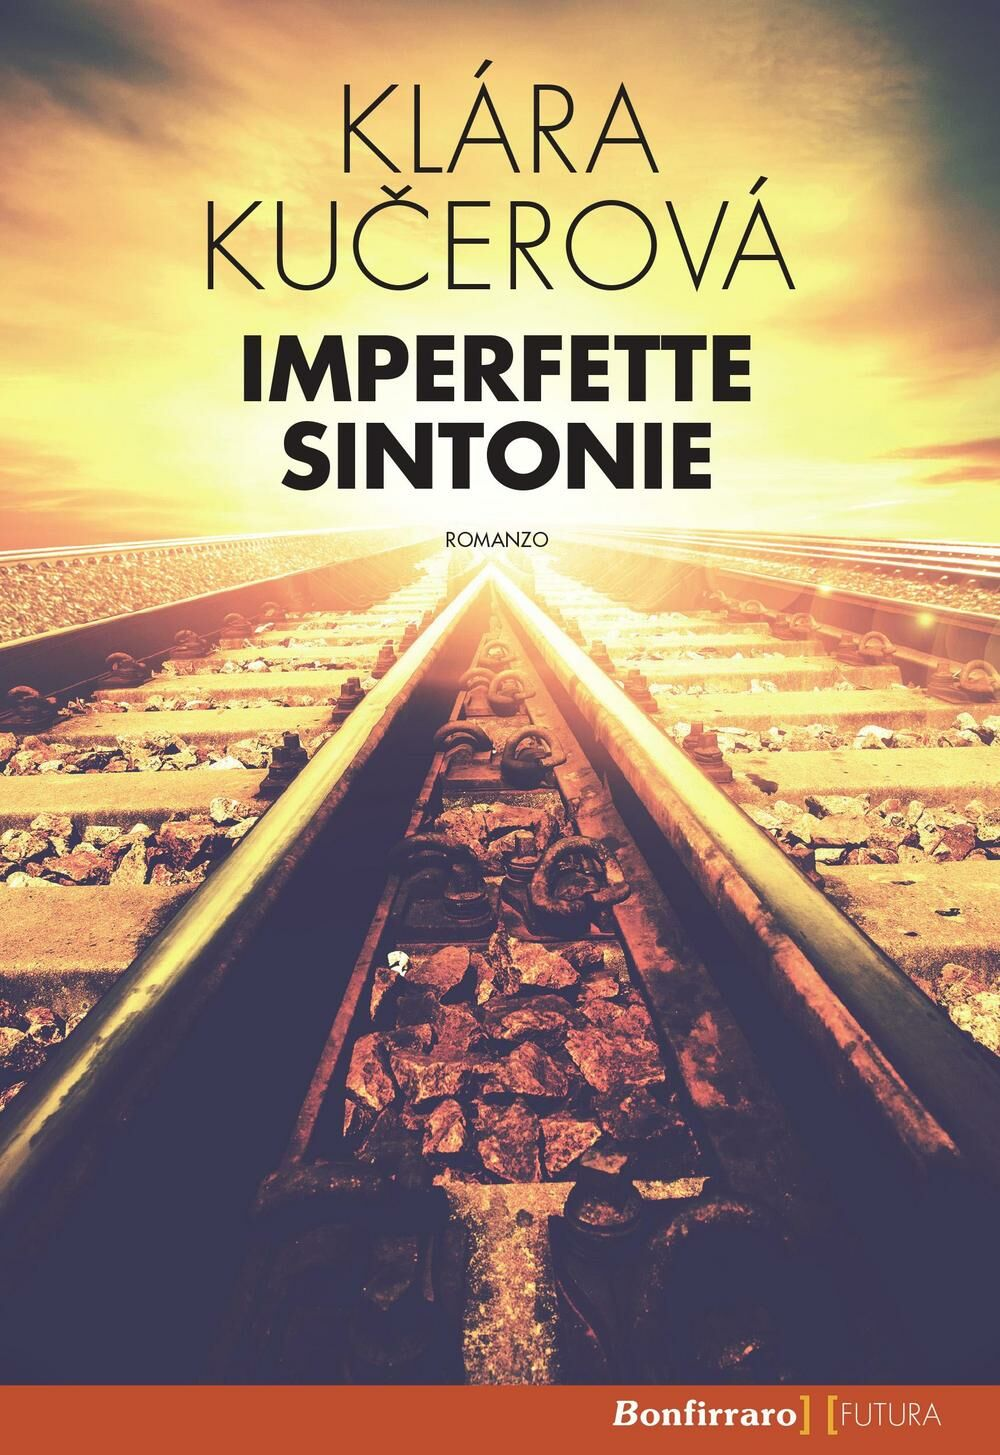 Imperfette sintonie